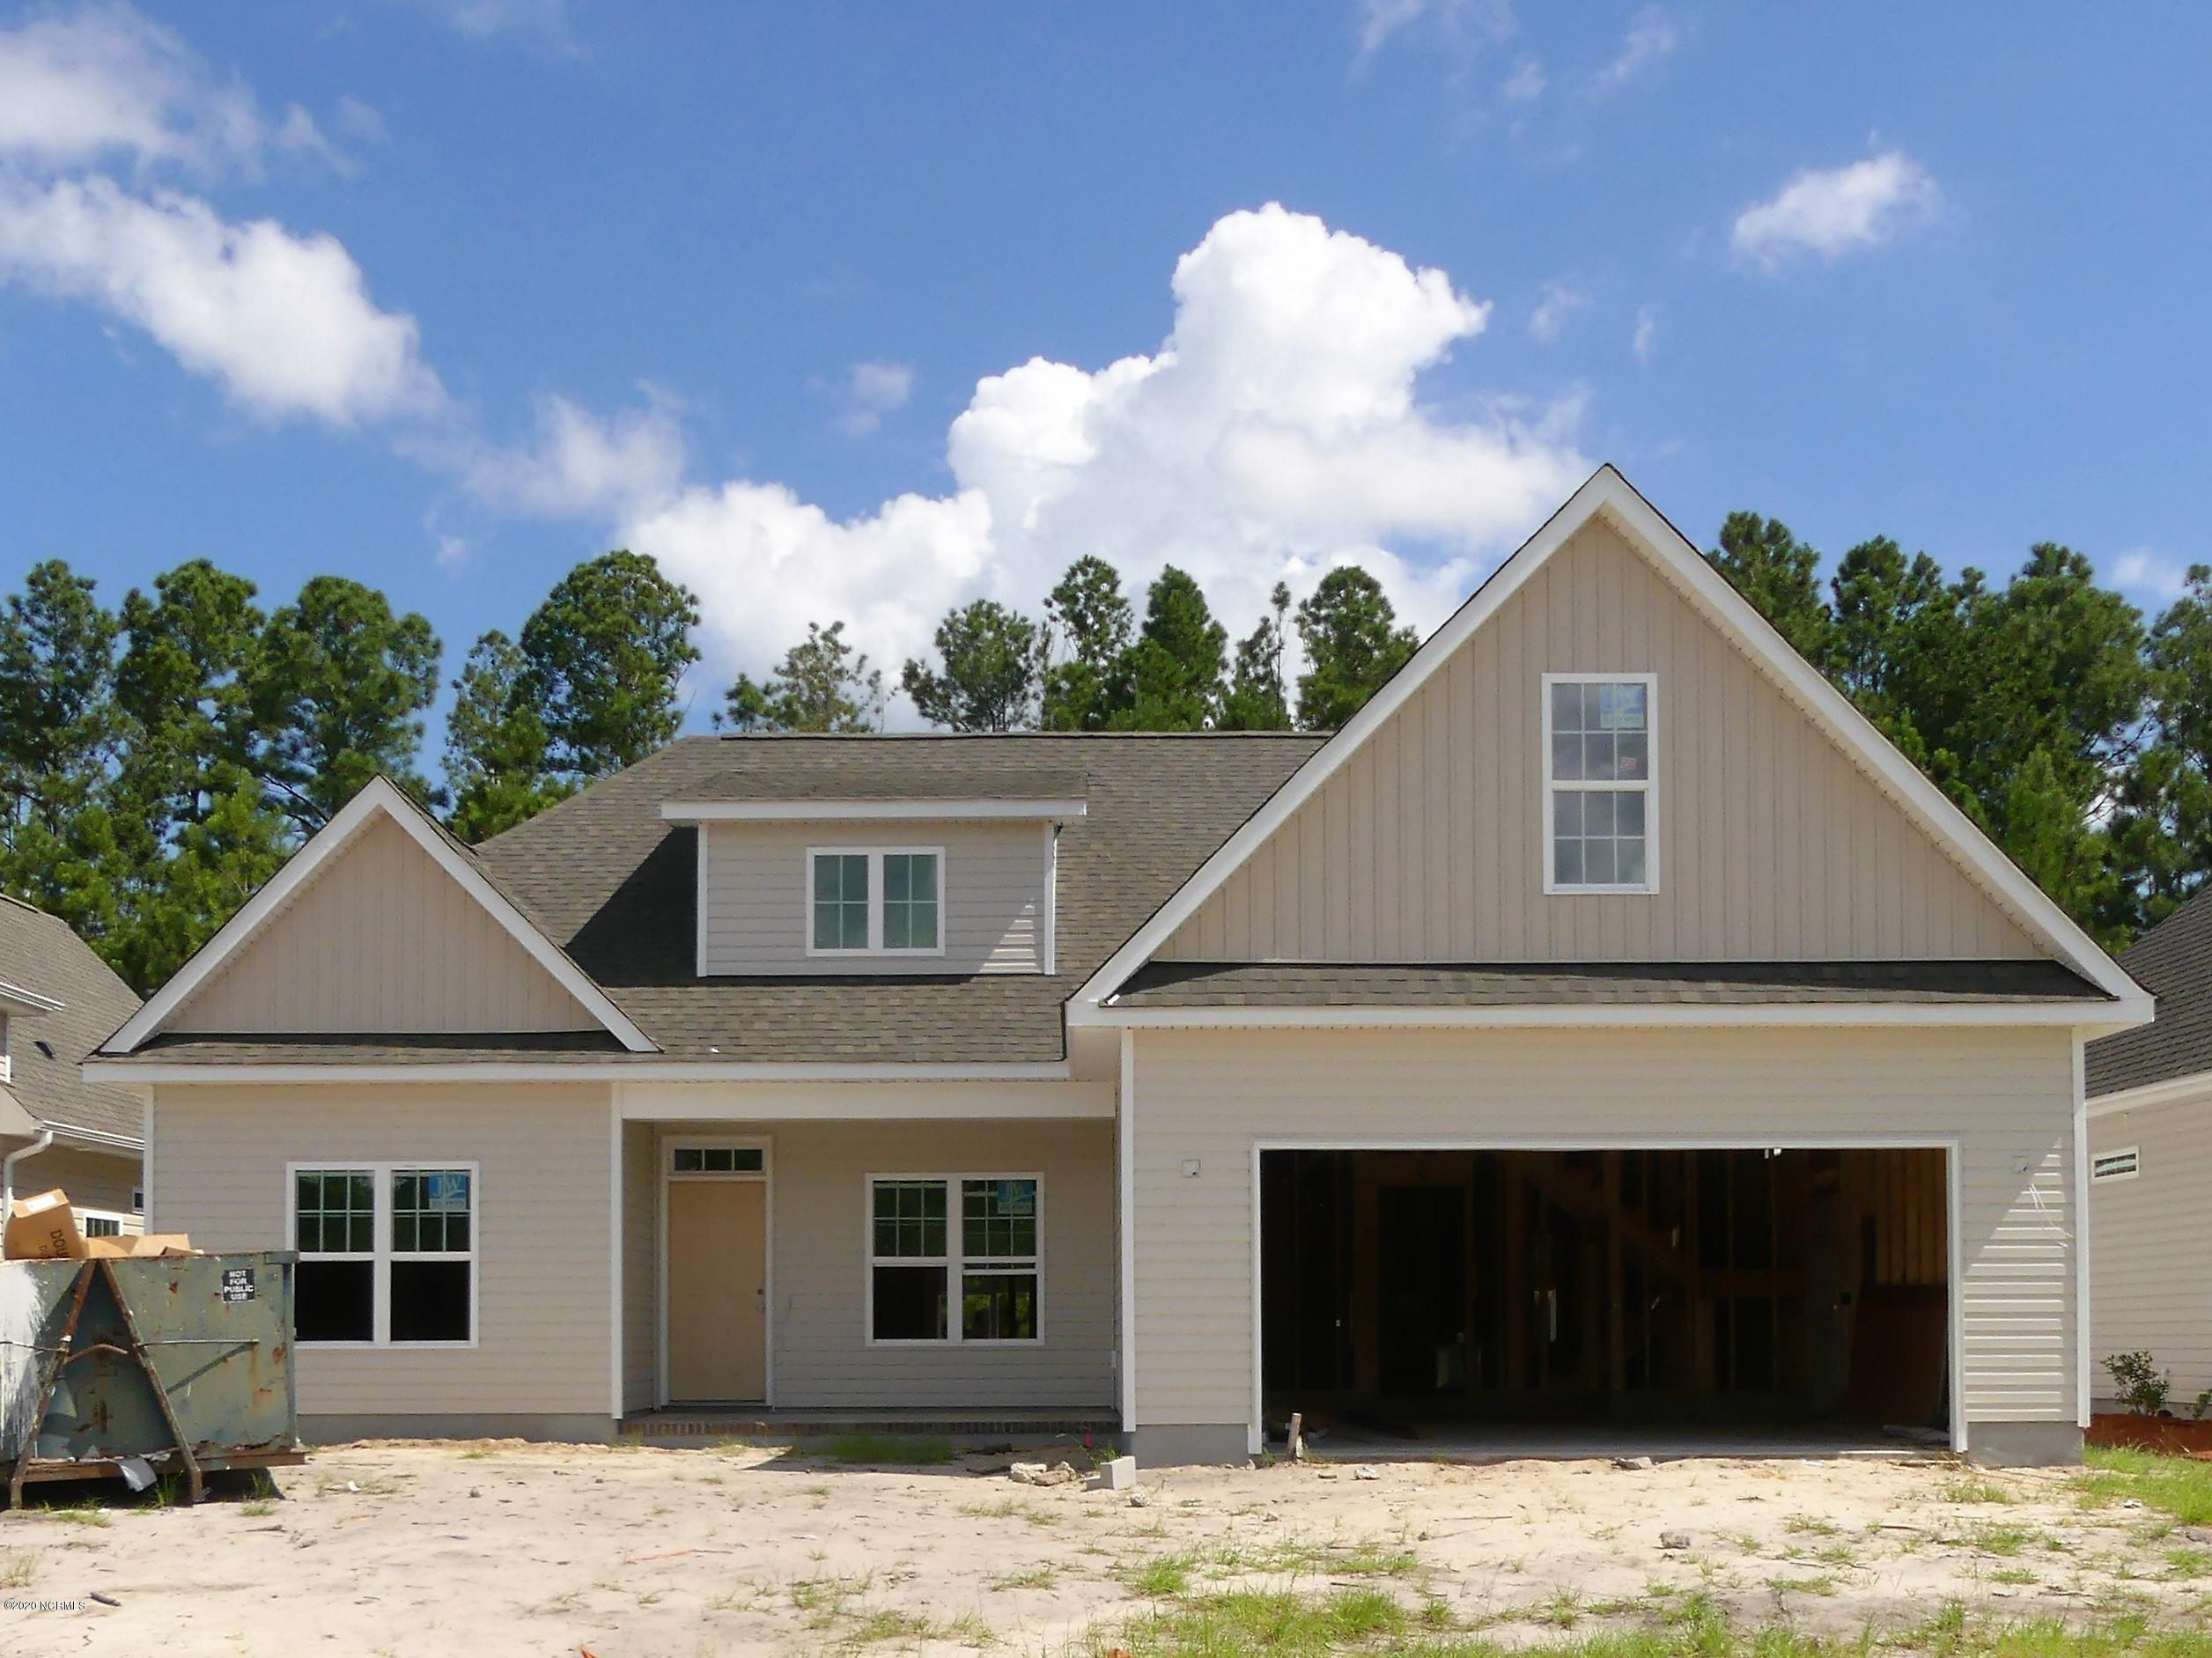 5338 Kincaid Place, Winnabow, North Carolina 28479, 3 Bedrooms Bedrooms, ,3 BathroomsBathrooms,Residential,For Sale,Kincaid,100211768